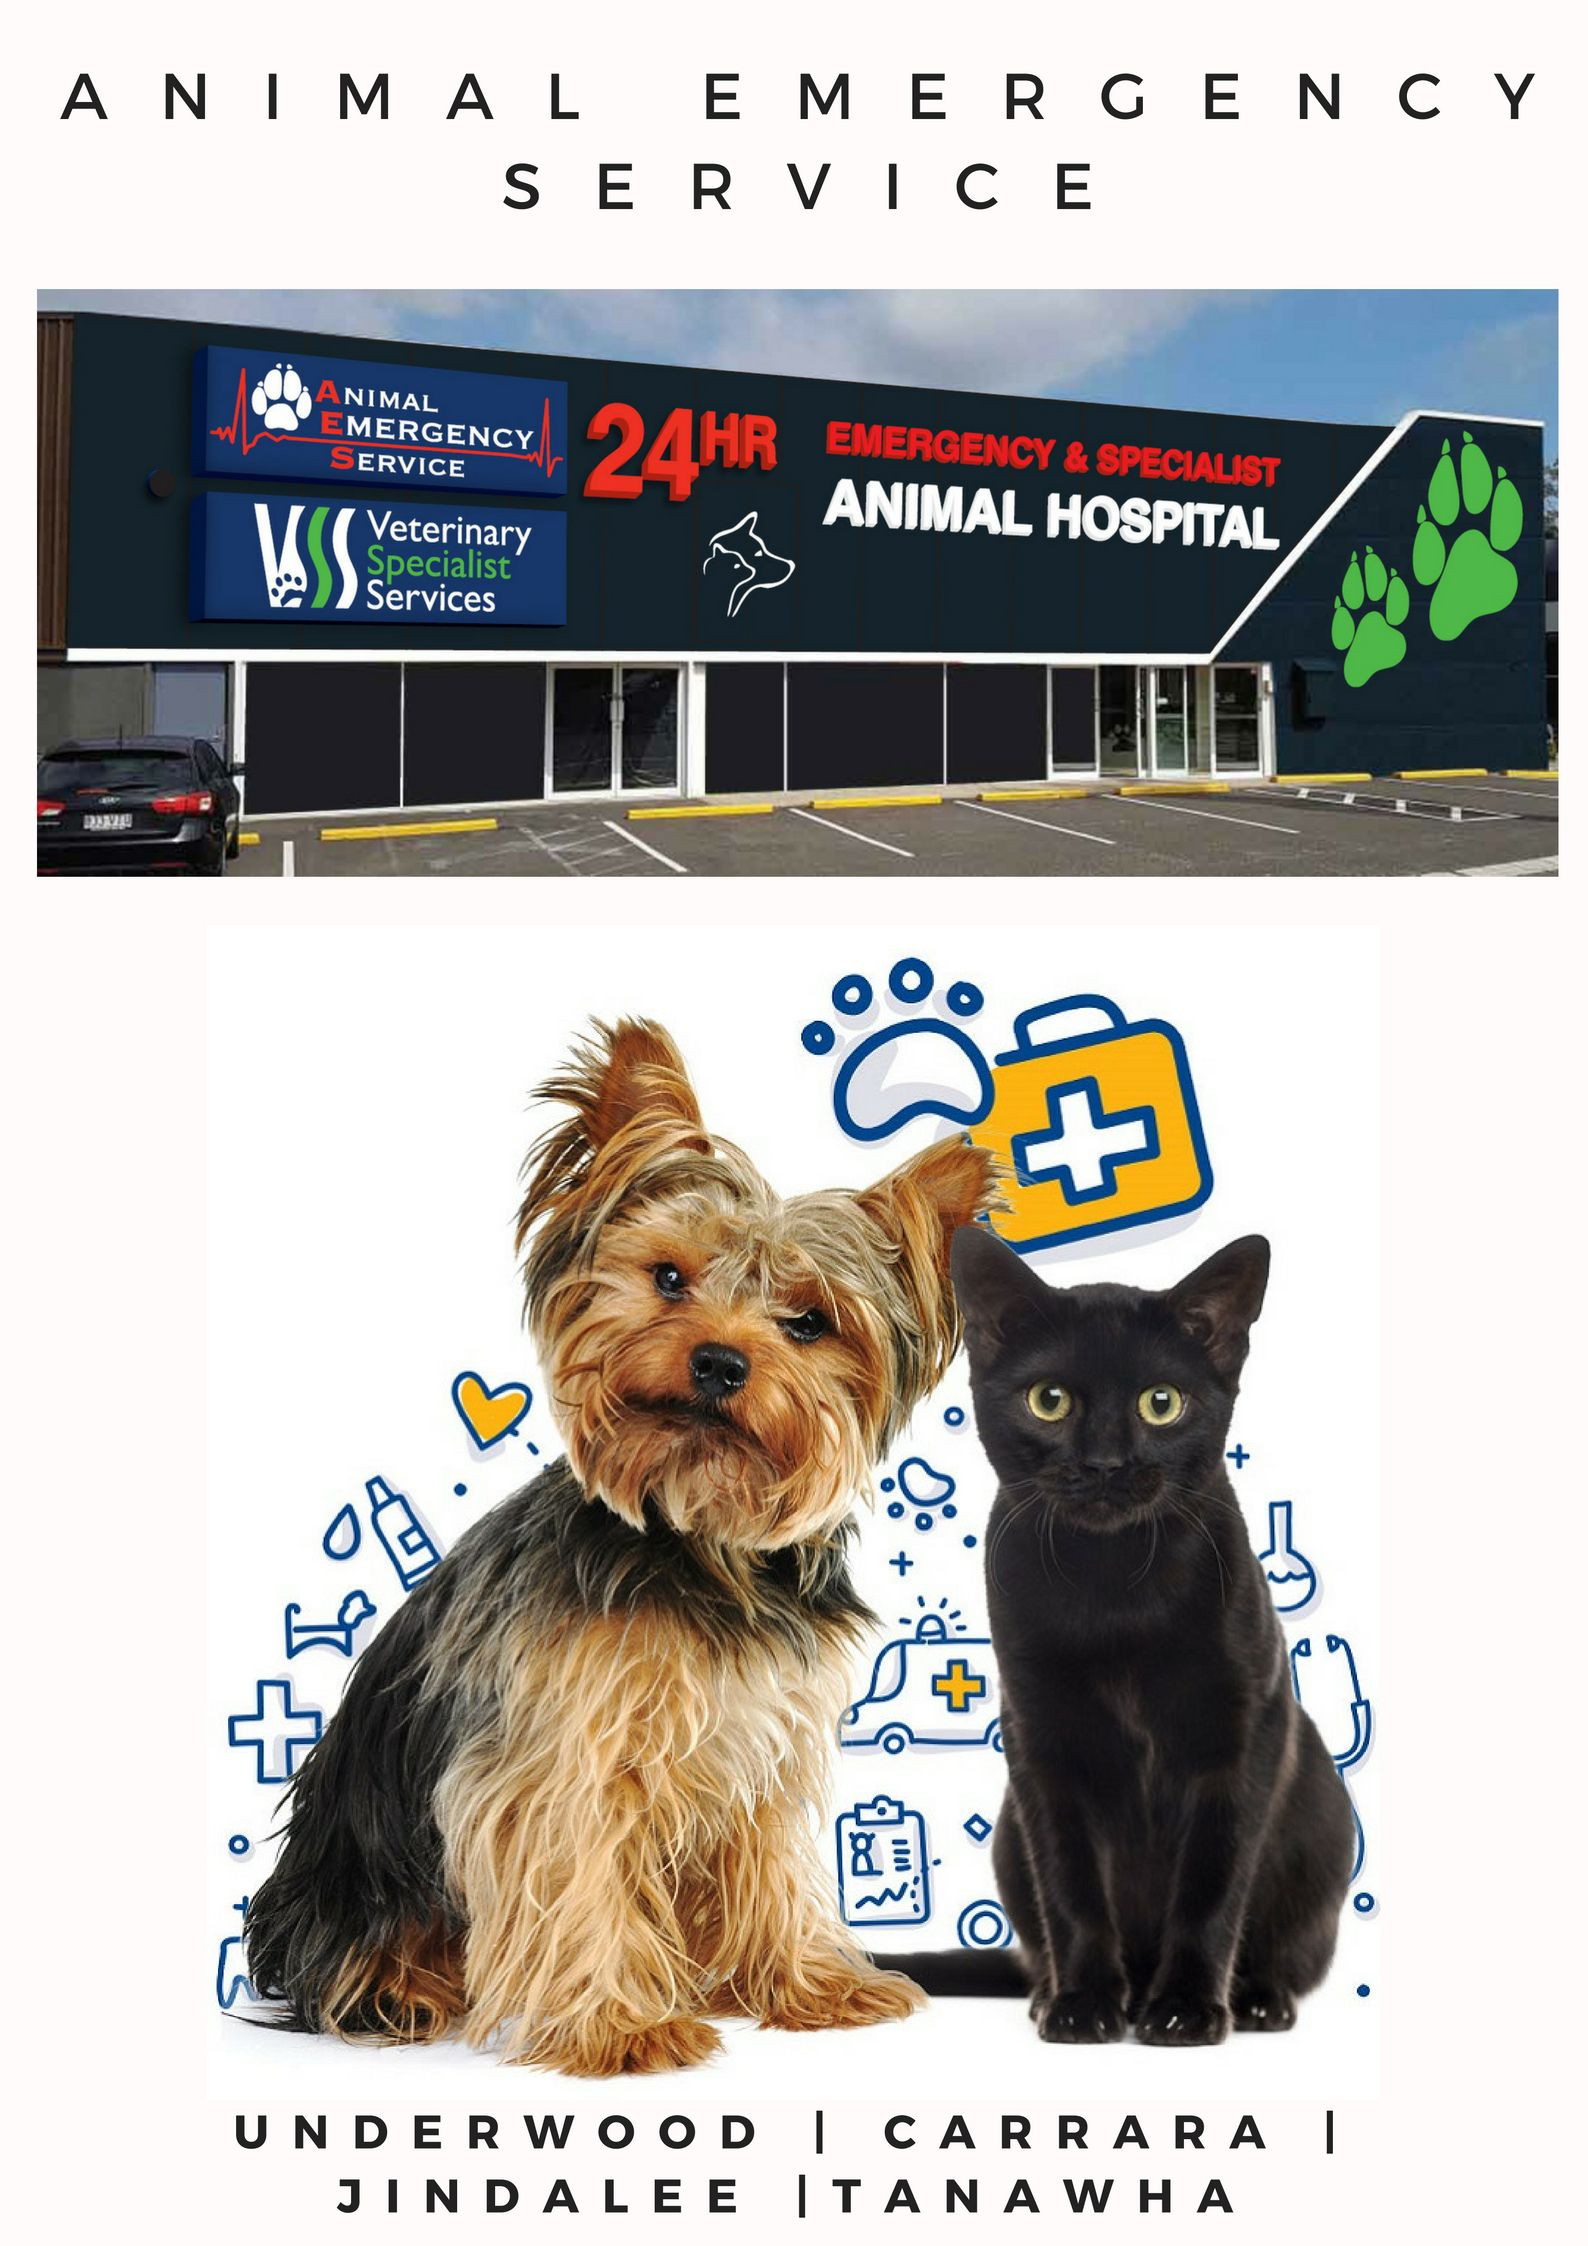 After Hours Vet Gold Coast Emergency vet, Service animal